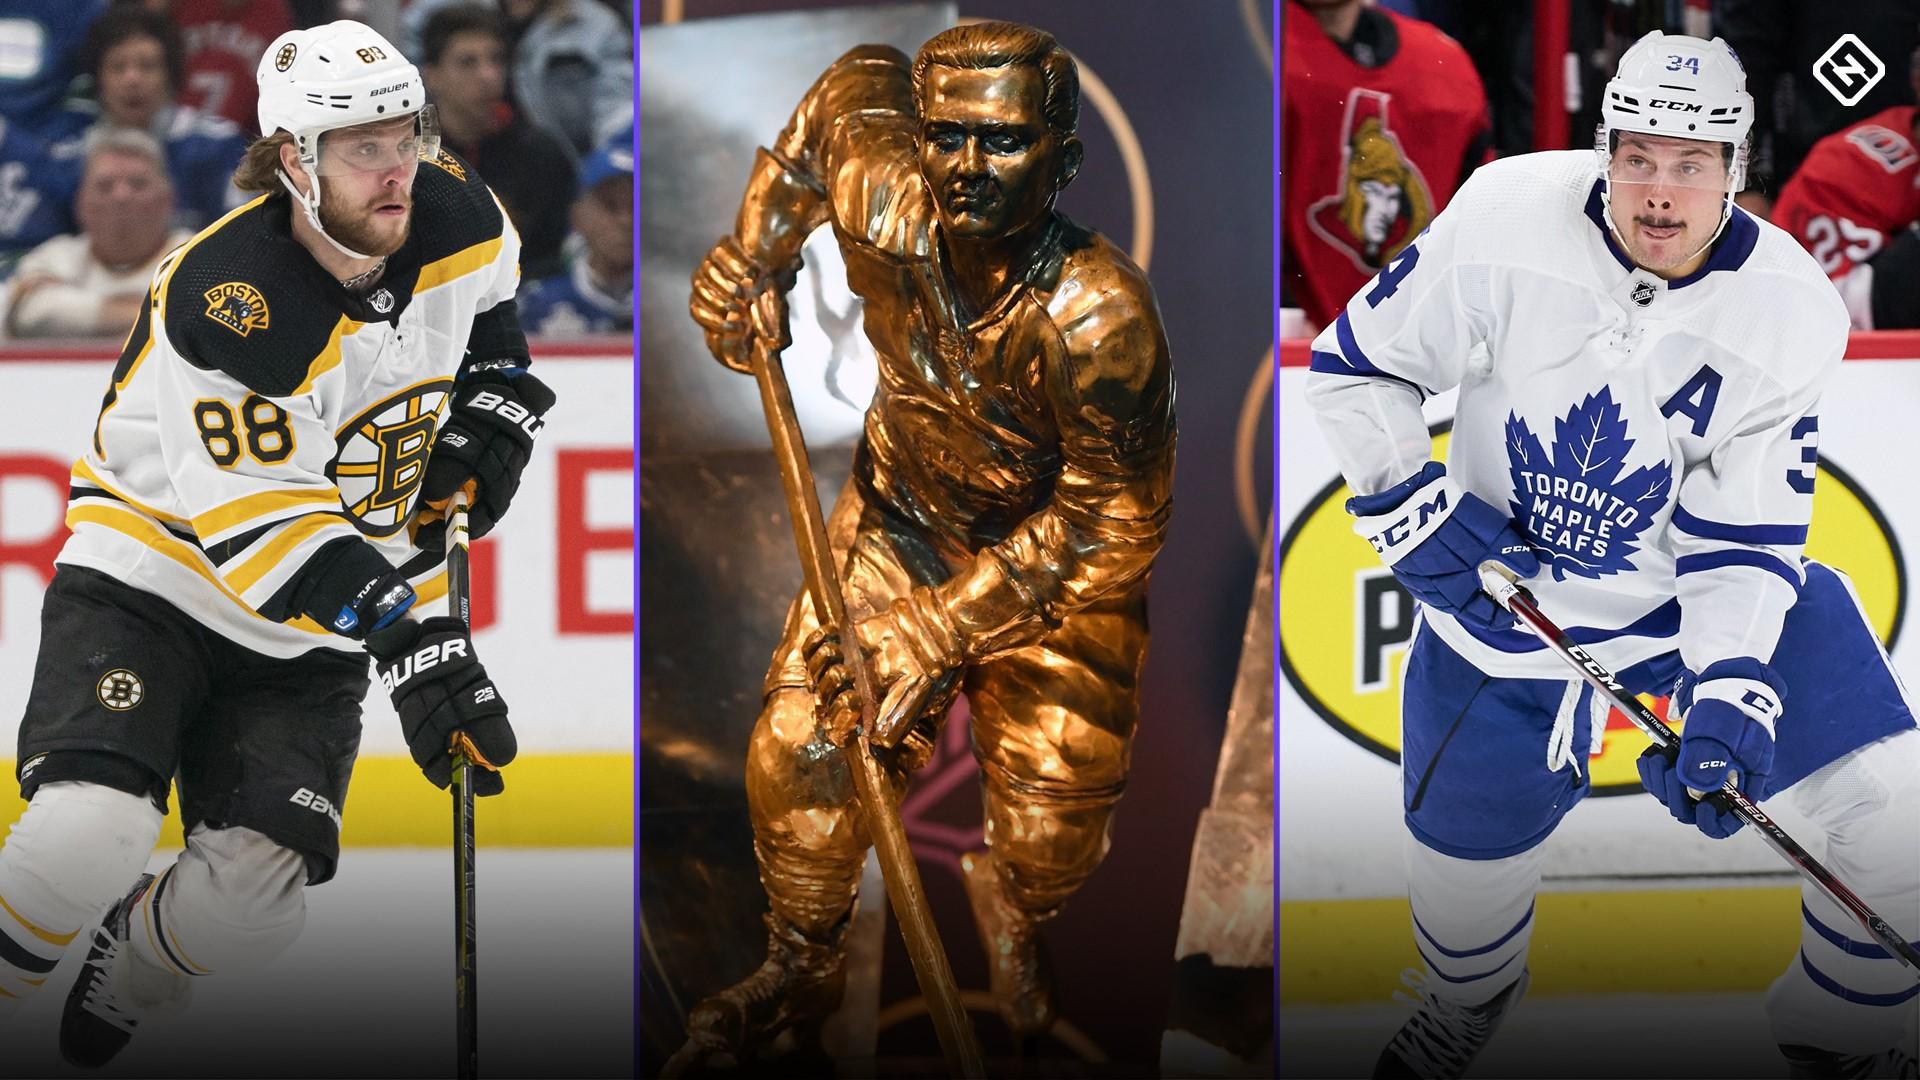 Rocket Richard Trophy: Leaders in 2019-20 NHL goal-scoring race, previous winners, history